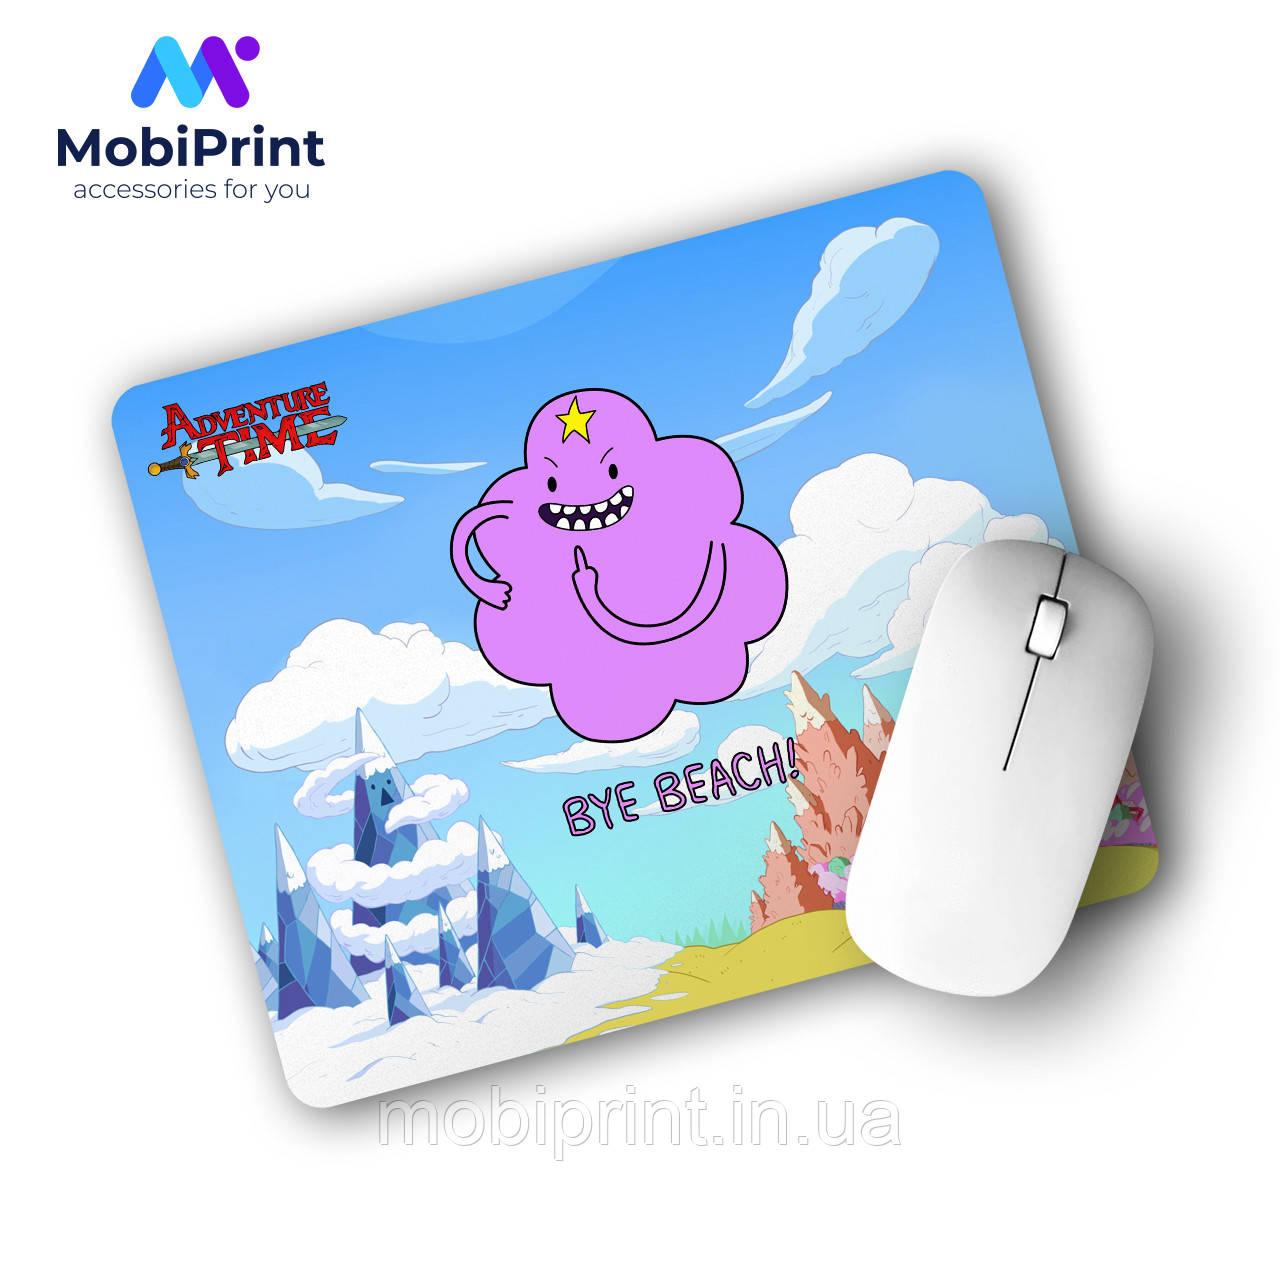 Коврик для мышки Принцесса пупырка Время приключений (Adventure Time) (25108-1578)